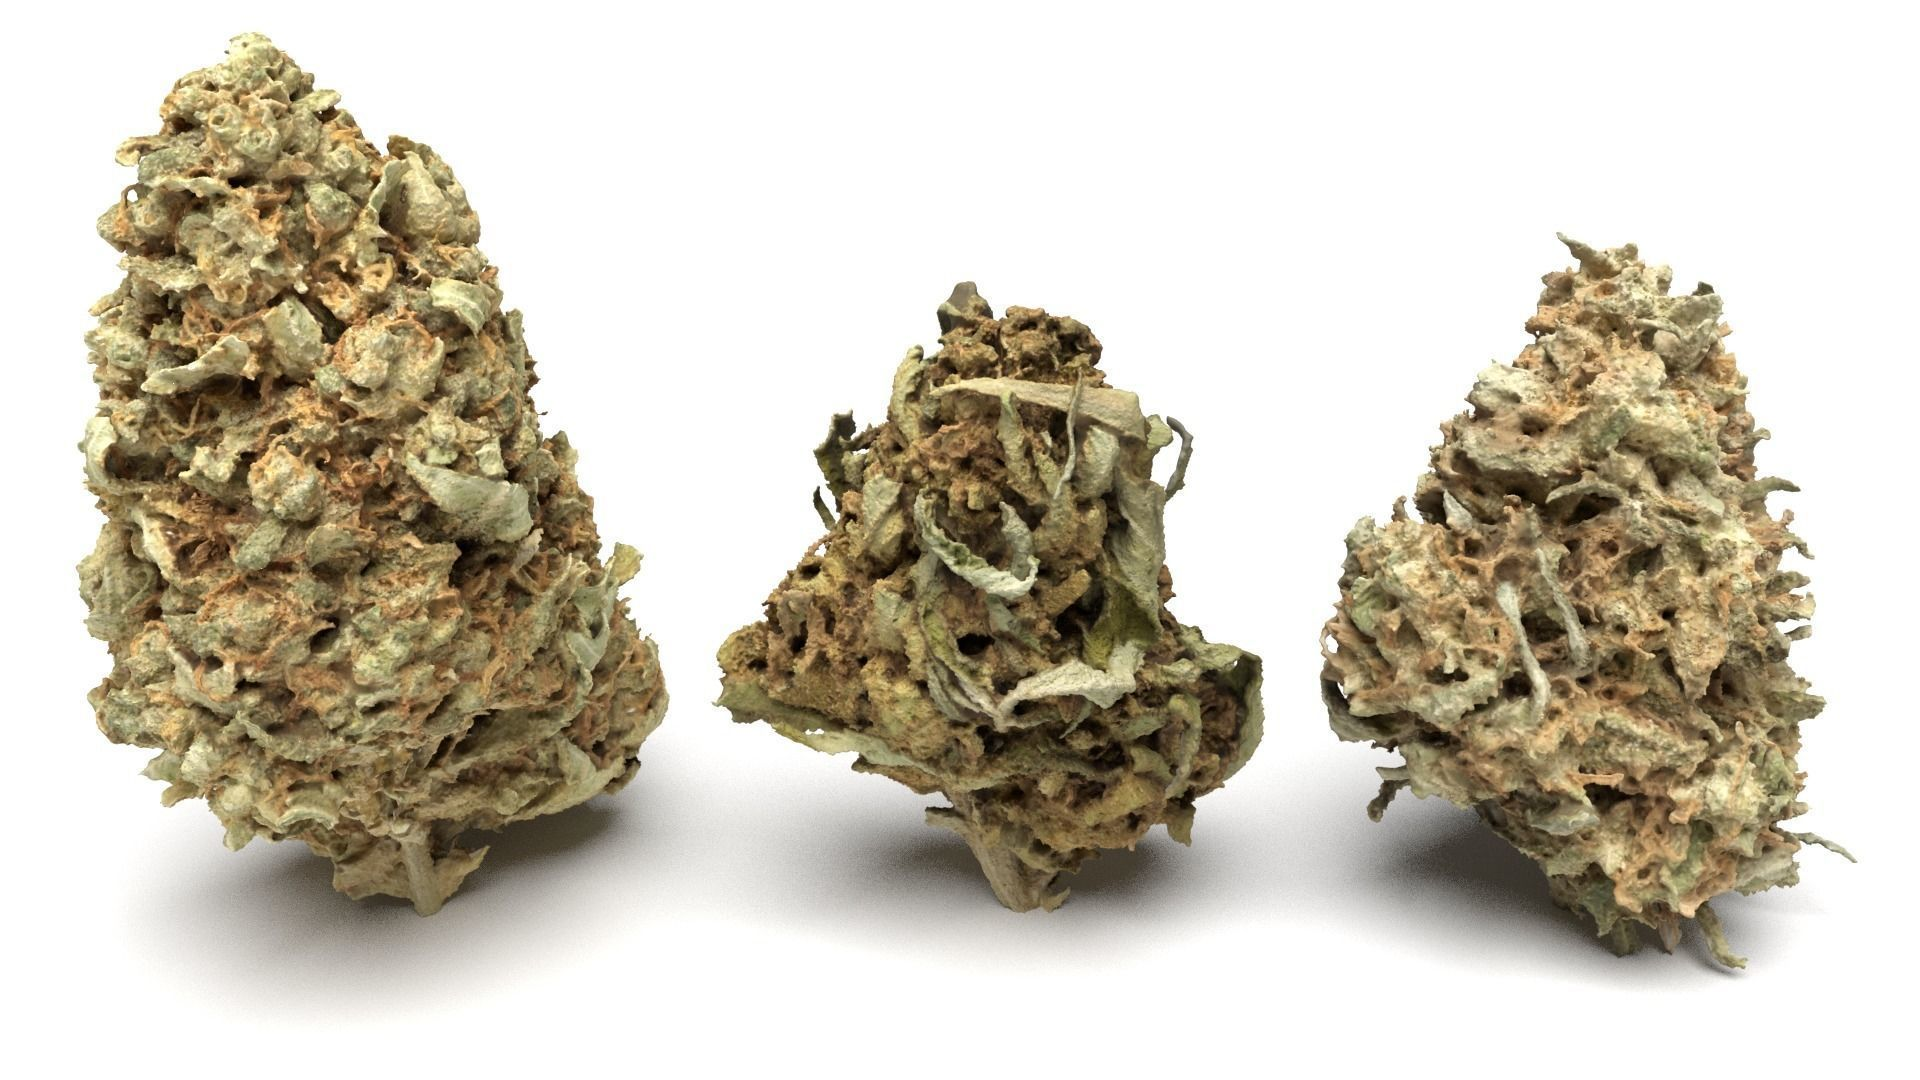 Cannabis Buds 3-Pack